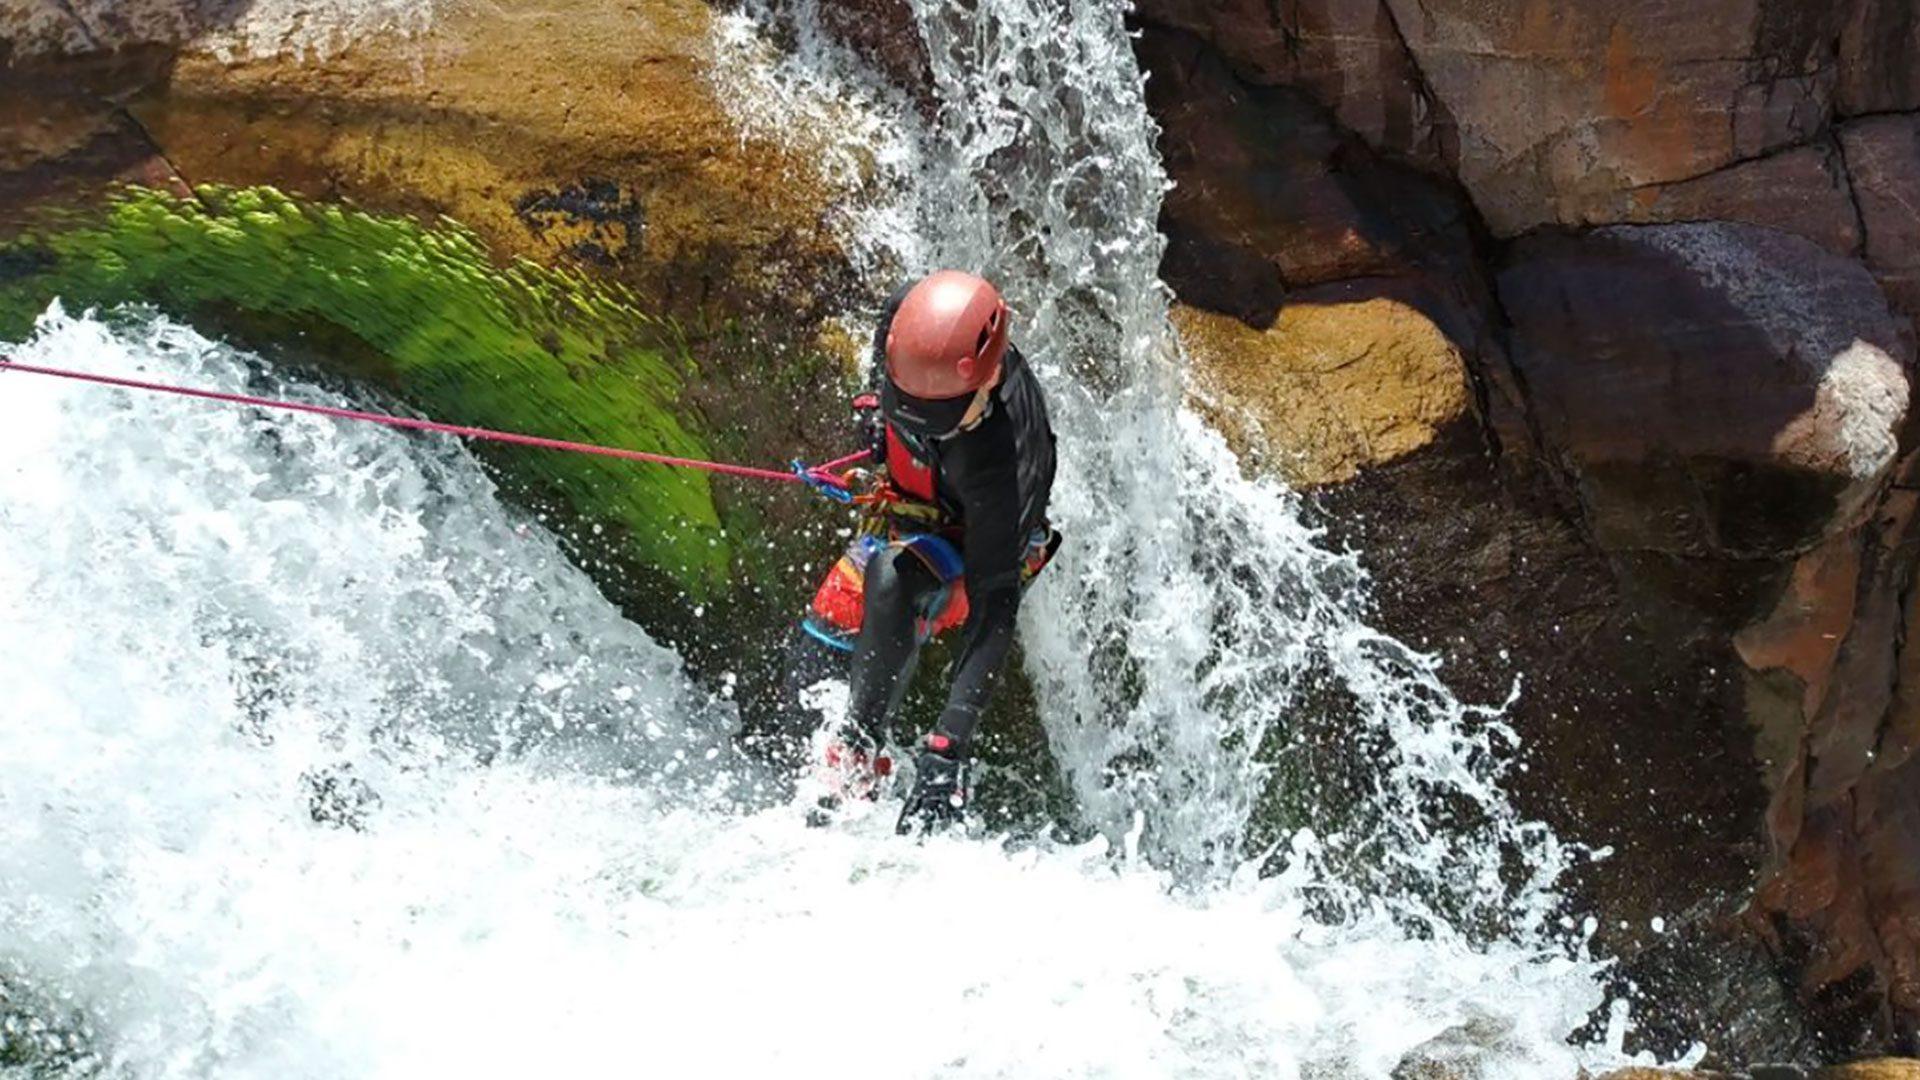 Canyoner descending a waterfall in Christopher Creek Arizona